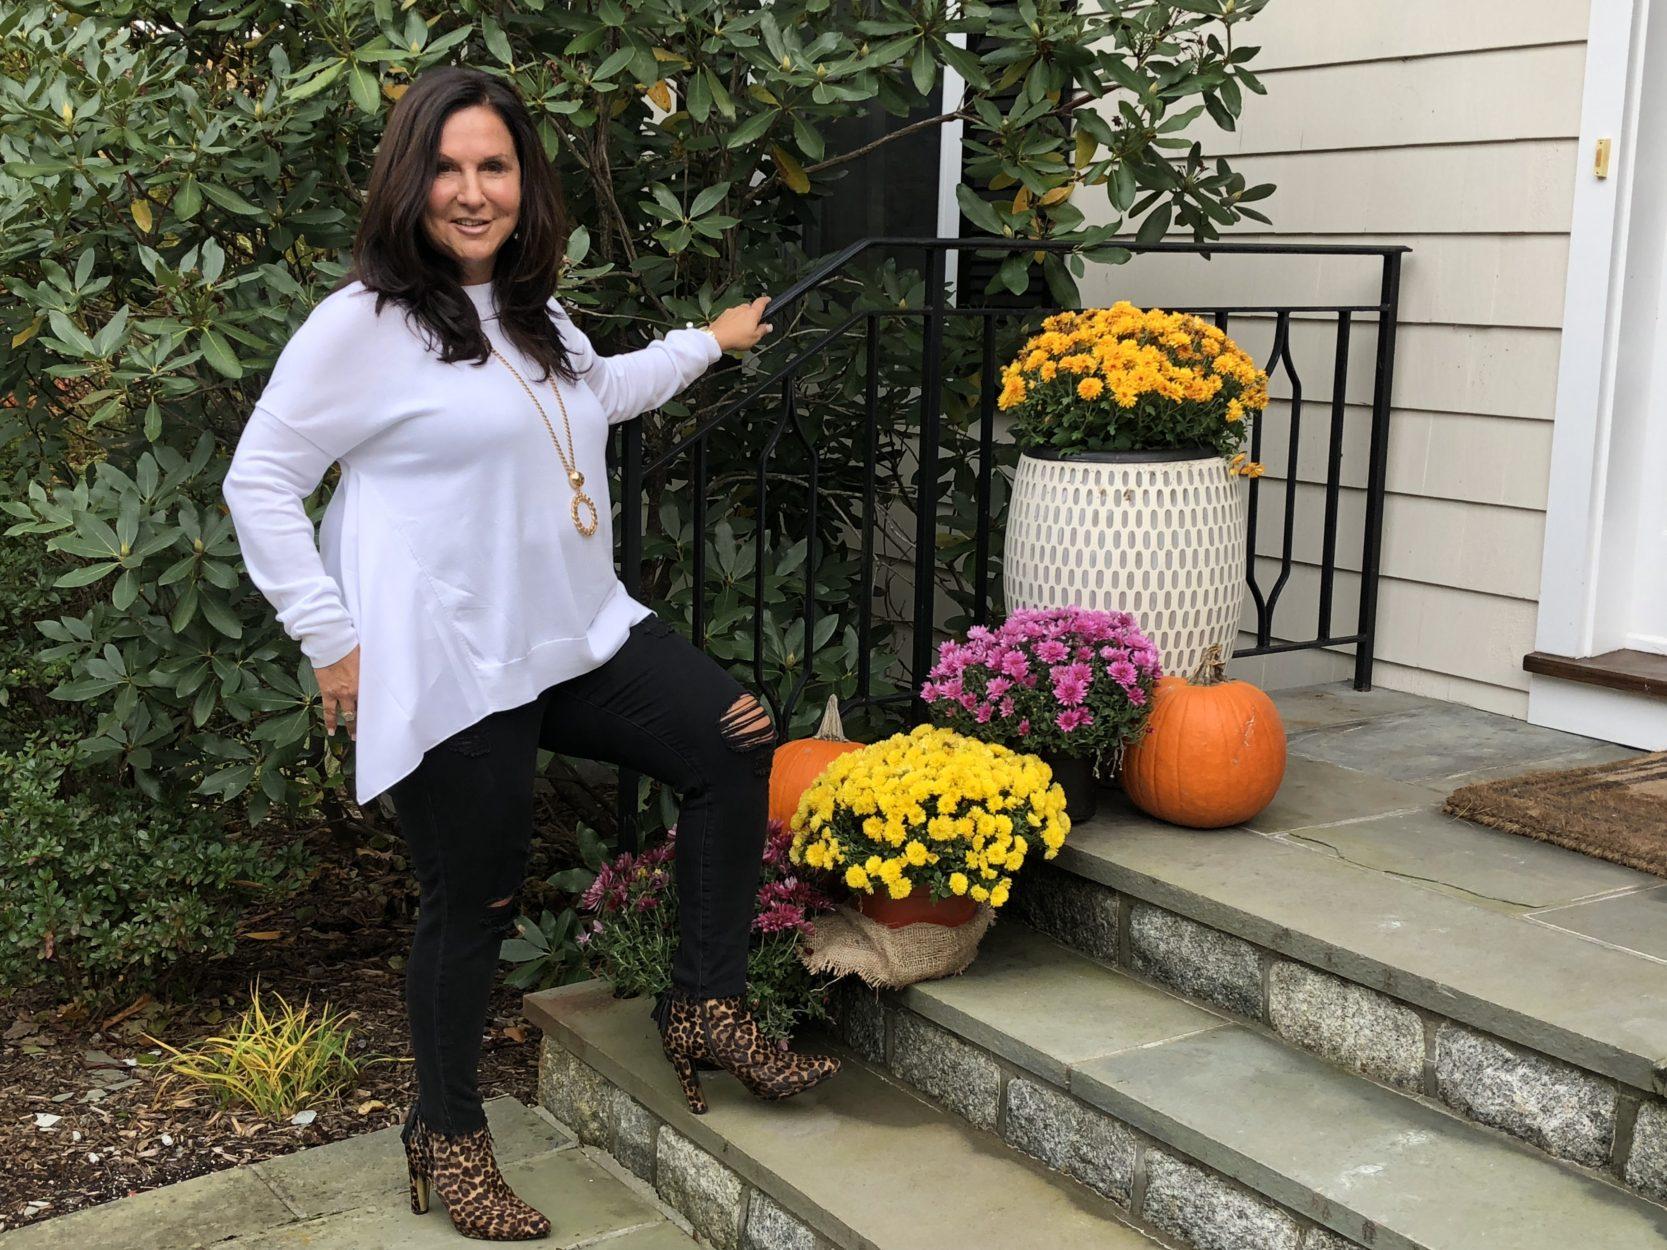 Lumi sweater in white